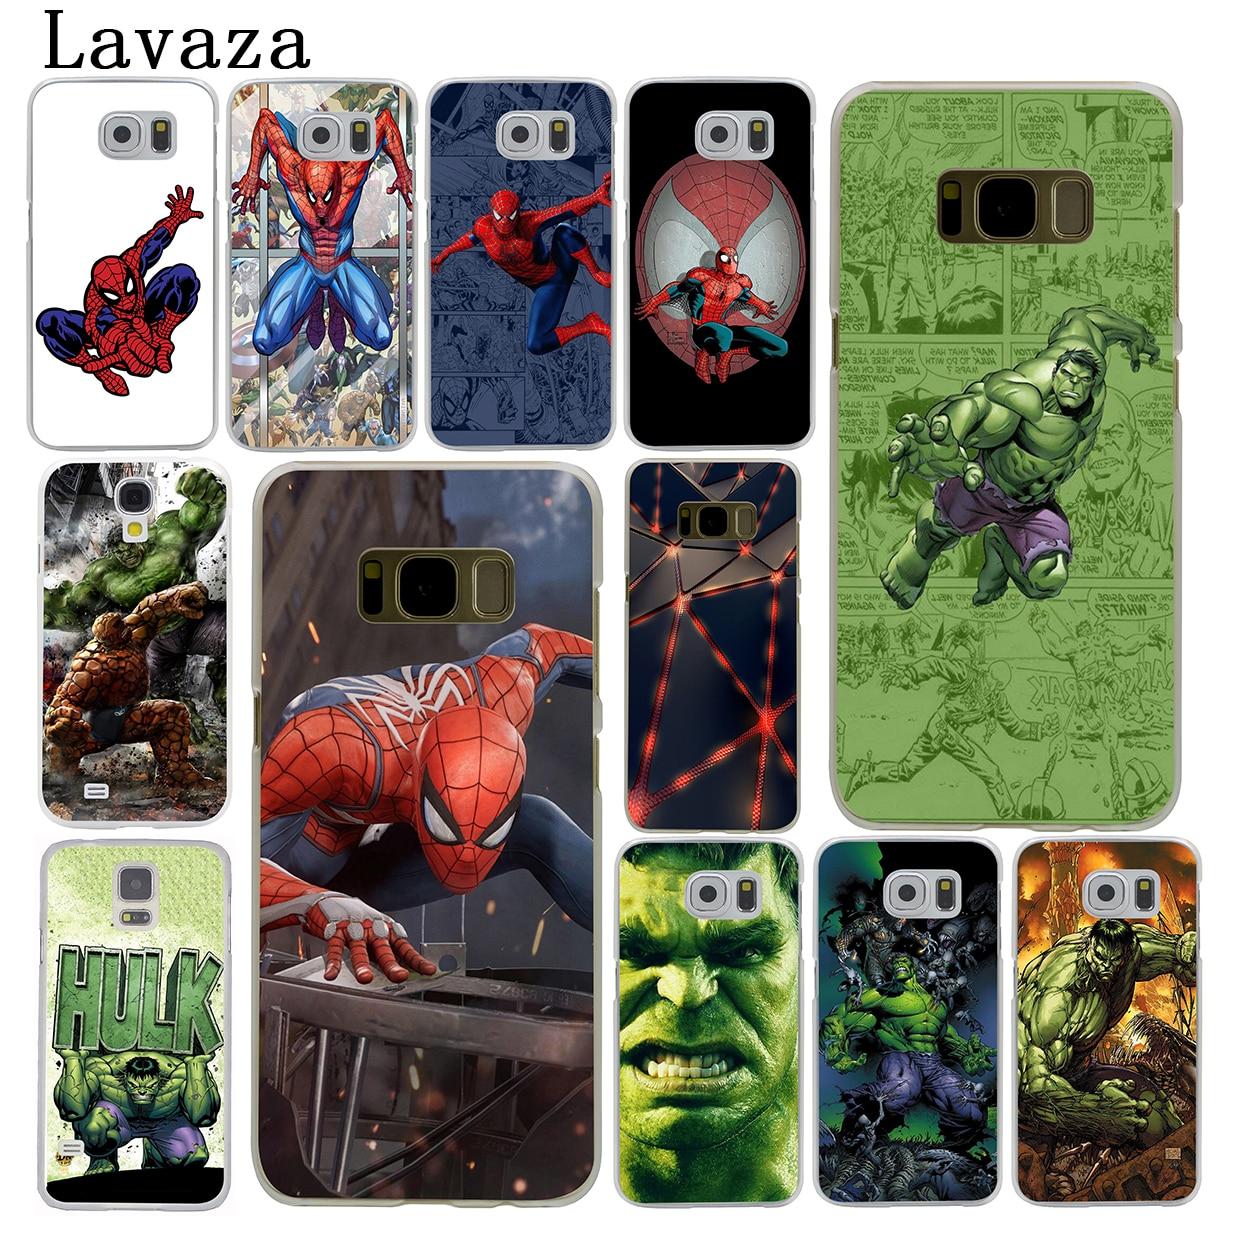 Lavaza Spider Man Marvel Hulk Hard Phone Cover Case for Samsung Galaxy S9 S6 S7 Edge S8 Plus S3 S4 S5 & Mini S2 Cases